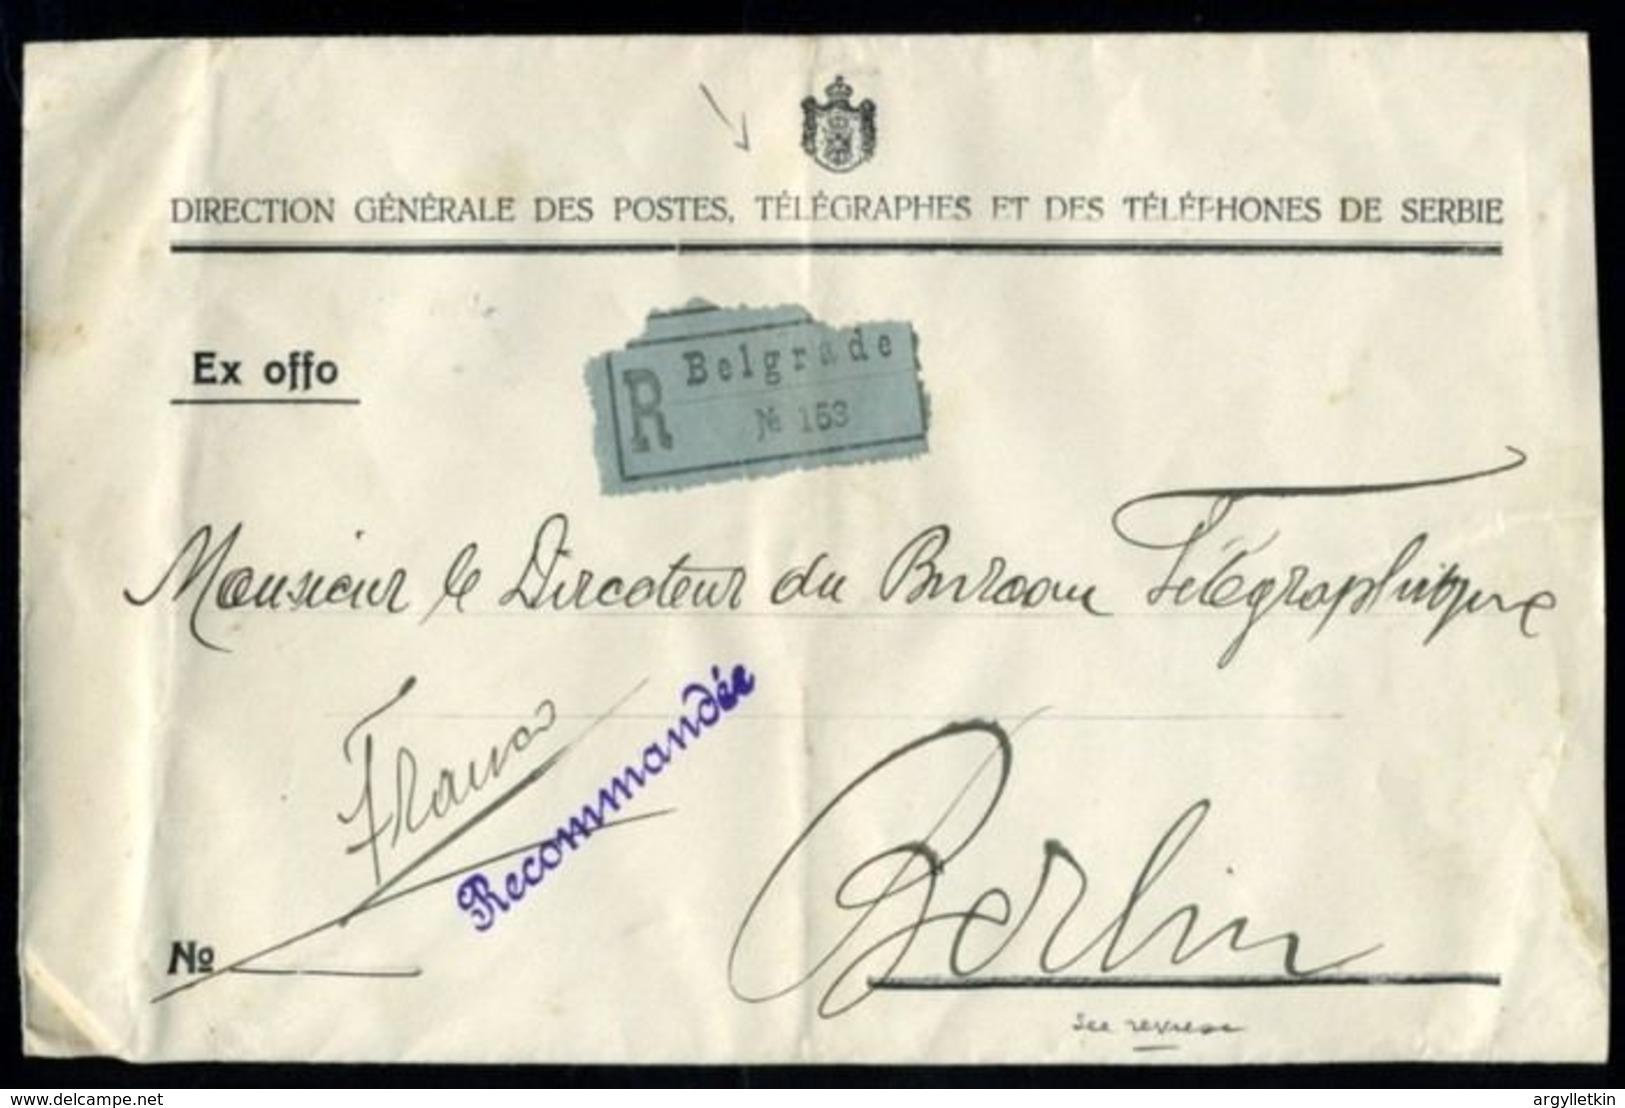 SERBIA OFFICIAL ENVELOPE 1912 - Serbia